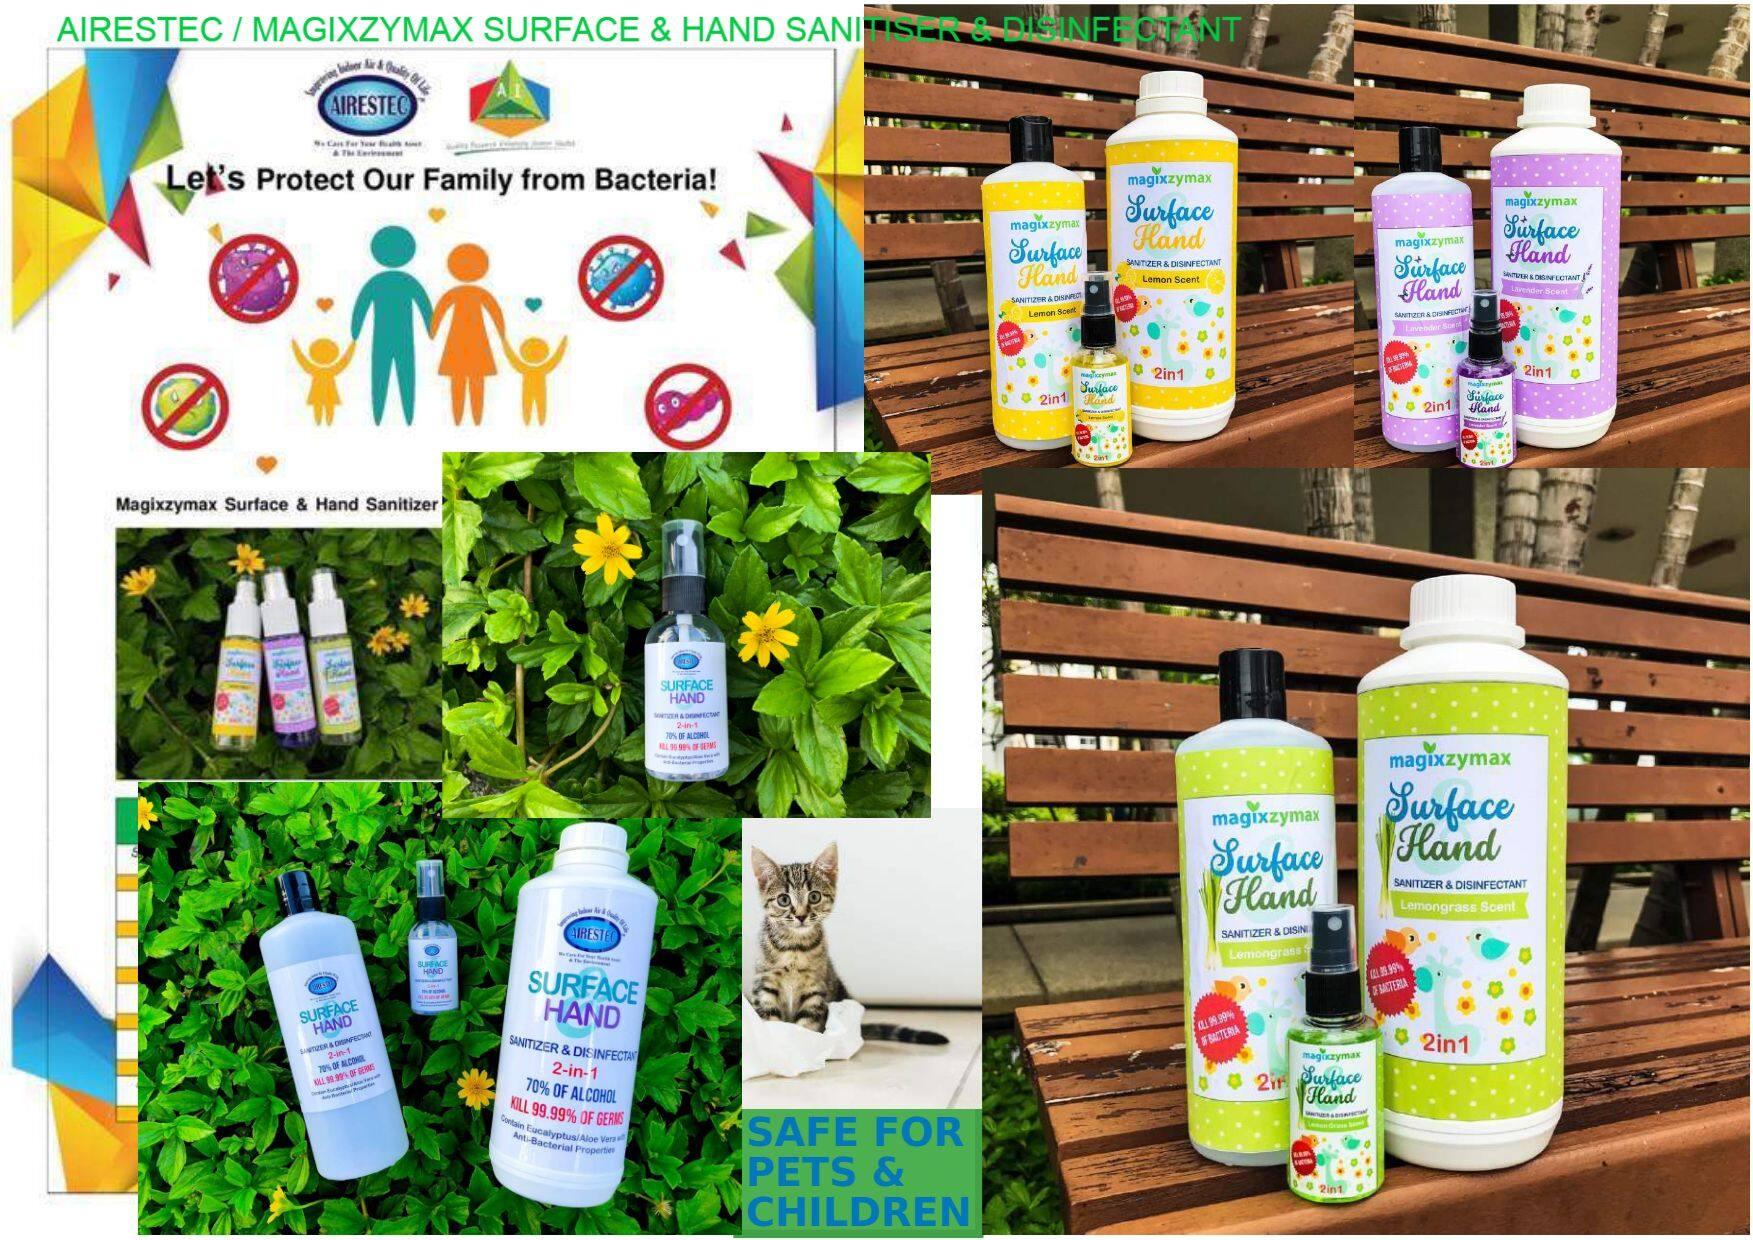 Airestec / Magixzymax Surface & Hand Sanitizer & Disinfectant #Eucalyptus #AloeVera #sanitiser #green #ecofriendly #eco #non-corrosive #neutral #child-friendly #pet-friendly #biodegradable #safe